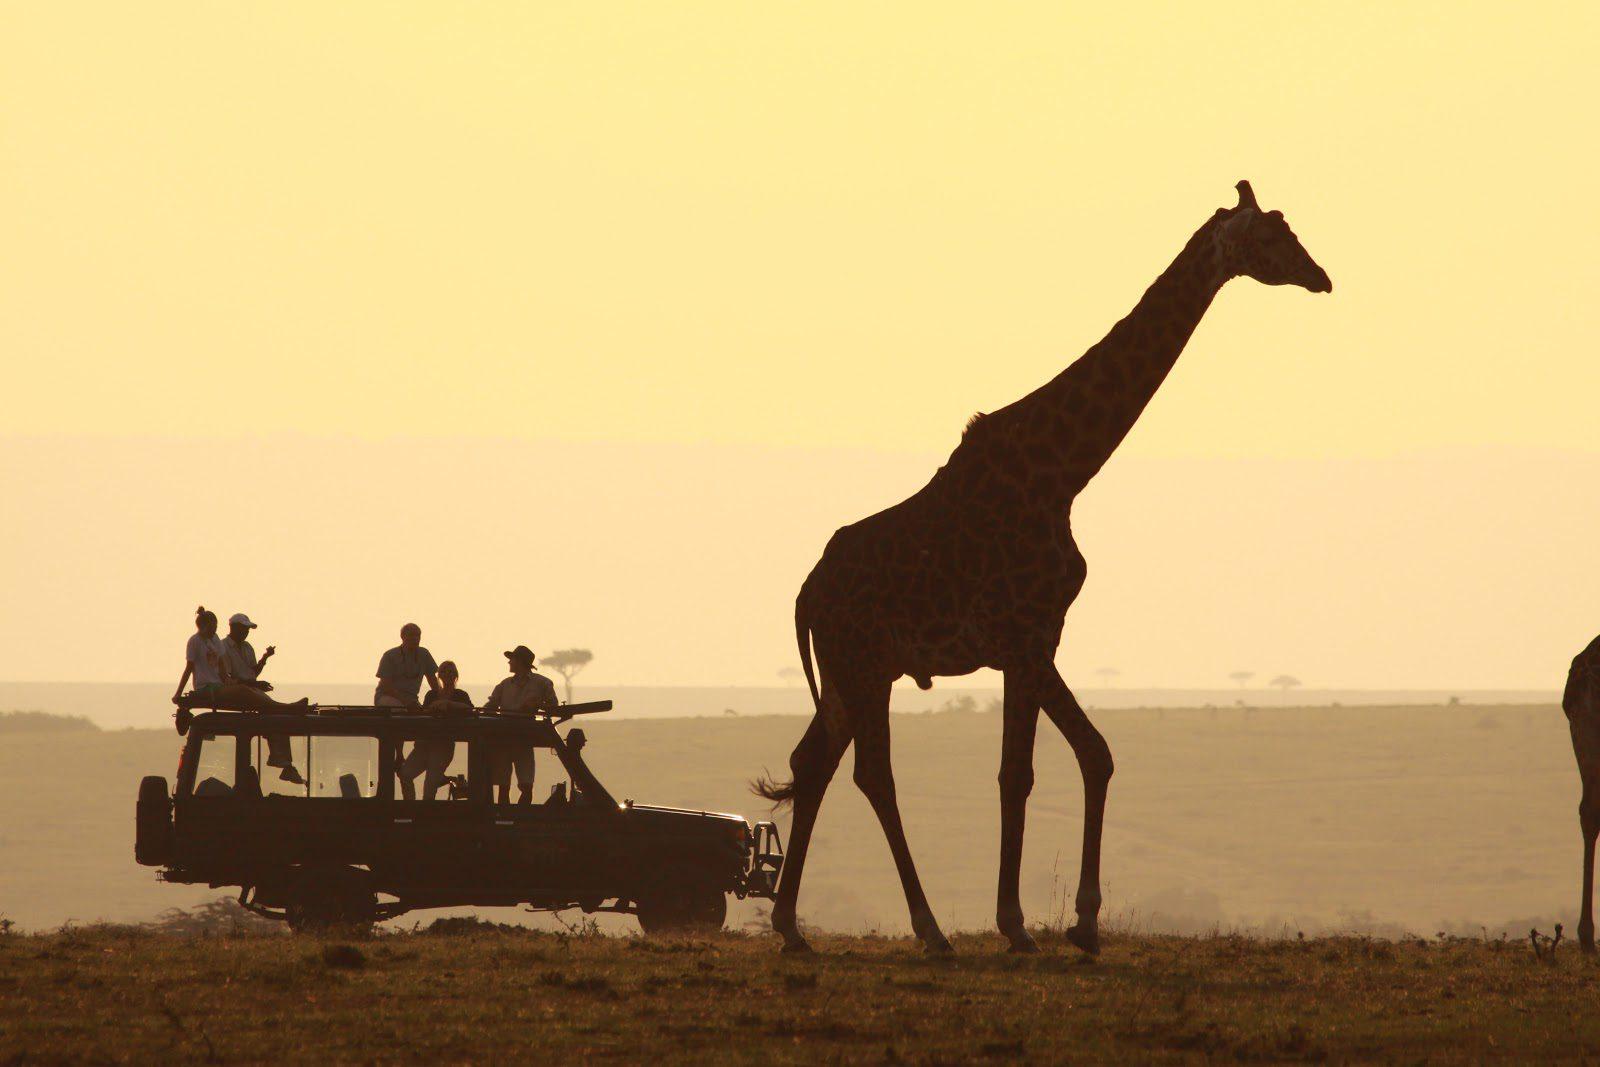 adventure Kenya safari vehicle observing a a giraffe on a game drive